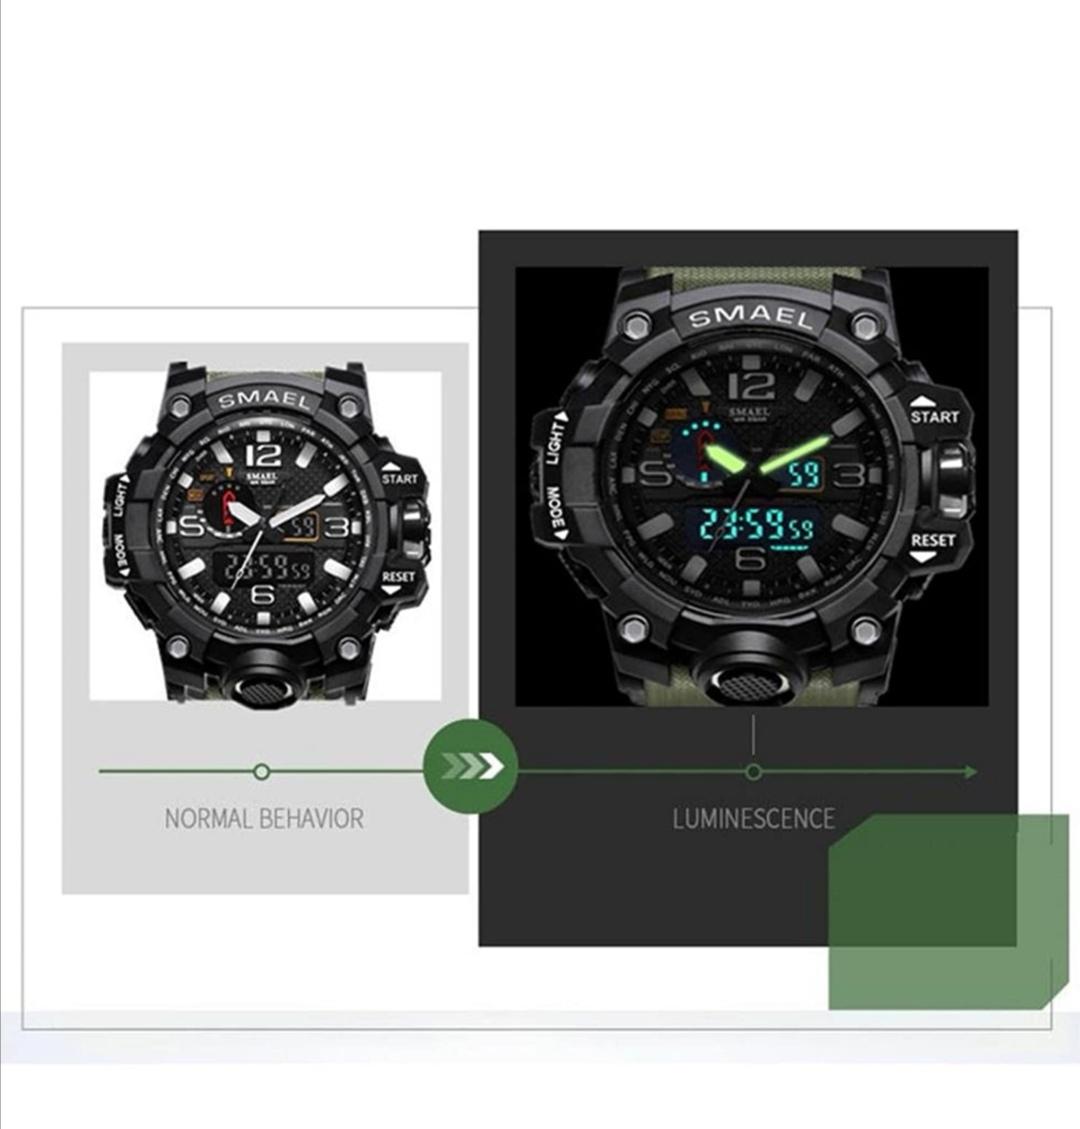 SMAELスマイル腕時計 メンズ メンズウォッチ 防水 スポーツ アナログ表示 デジタル クオーツ腕時計 多機能 ミリタリー ライト 運動腕時計_画像5